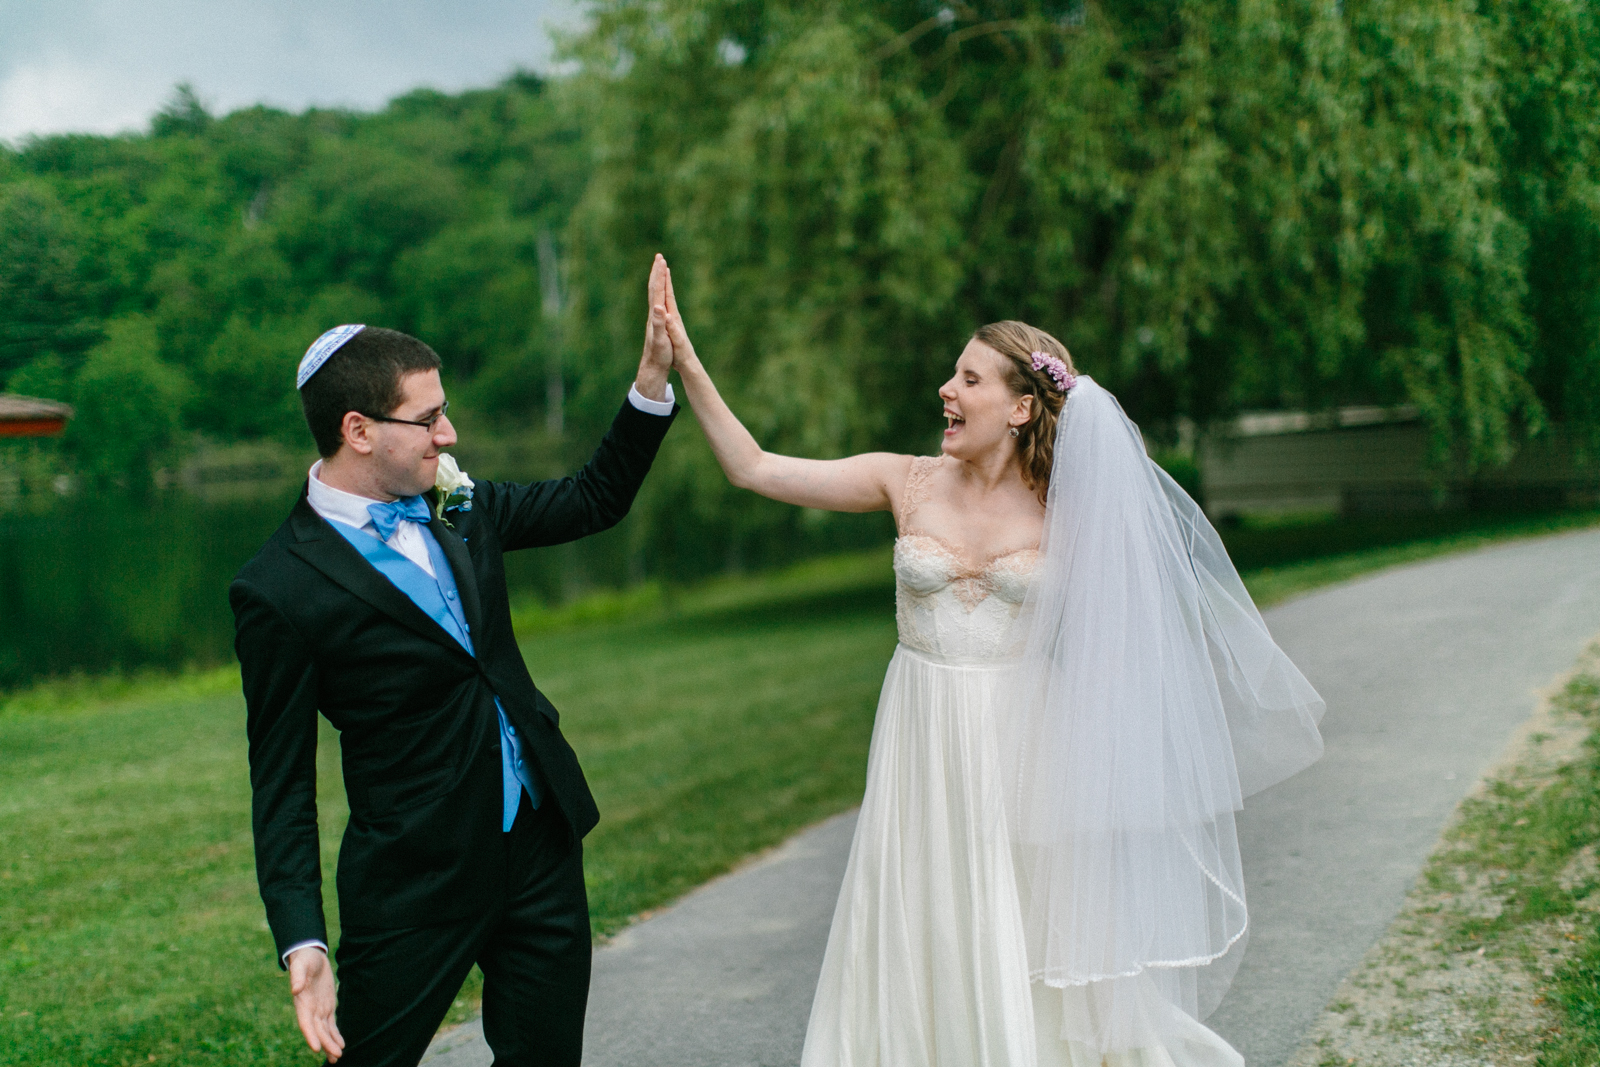 newlyweds high-fiving